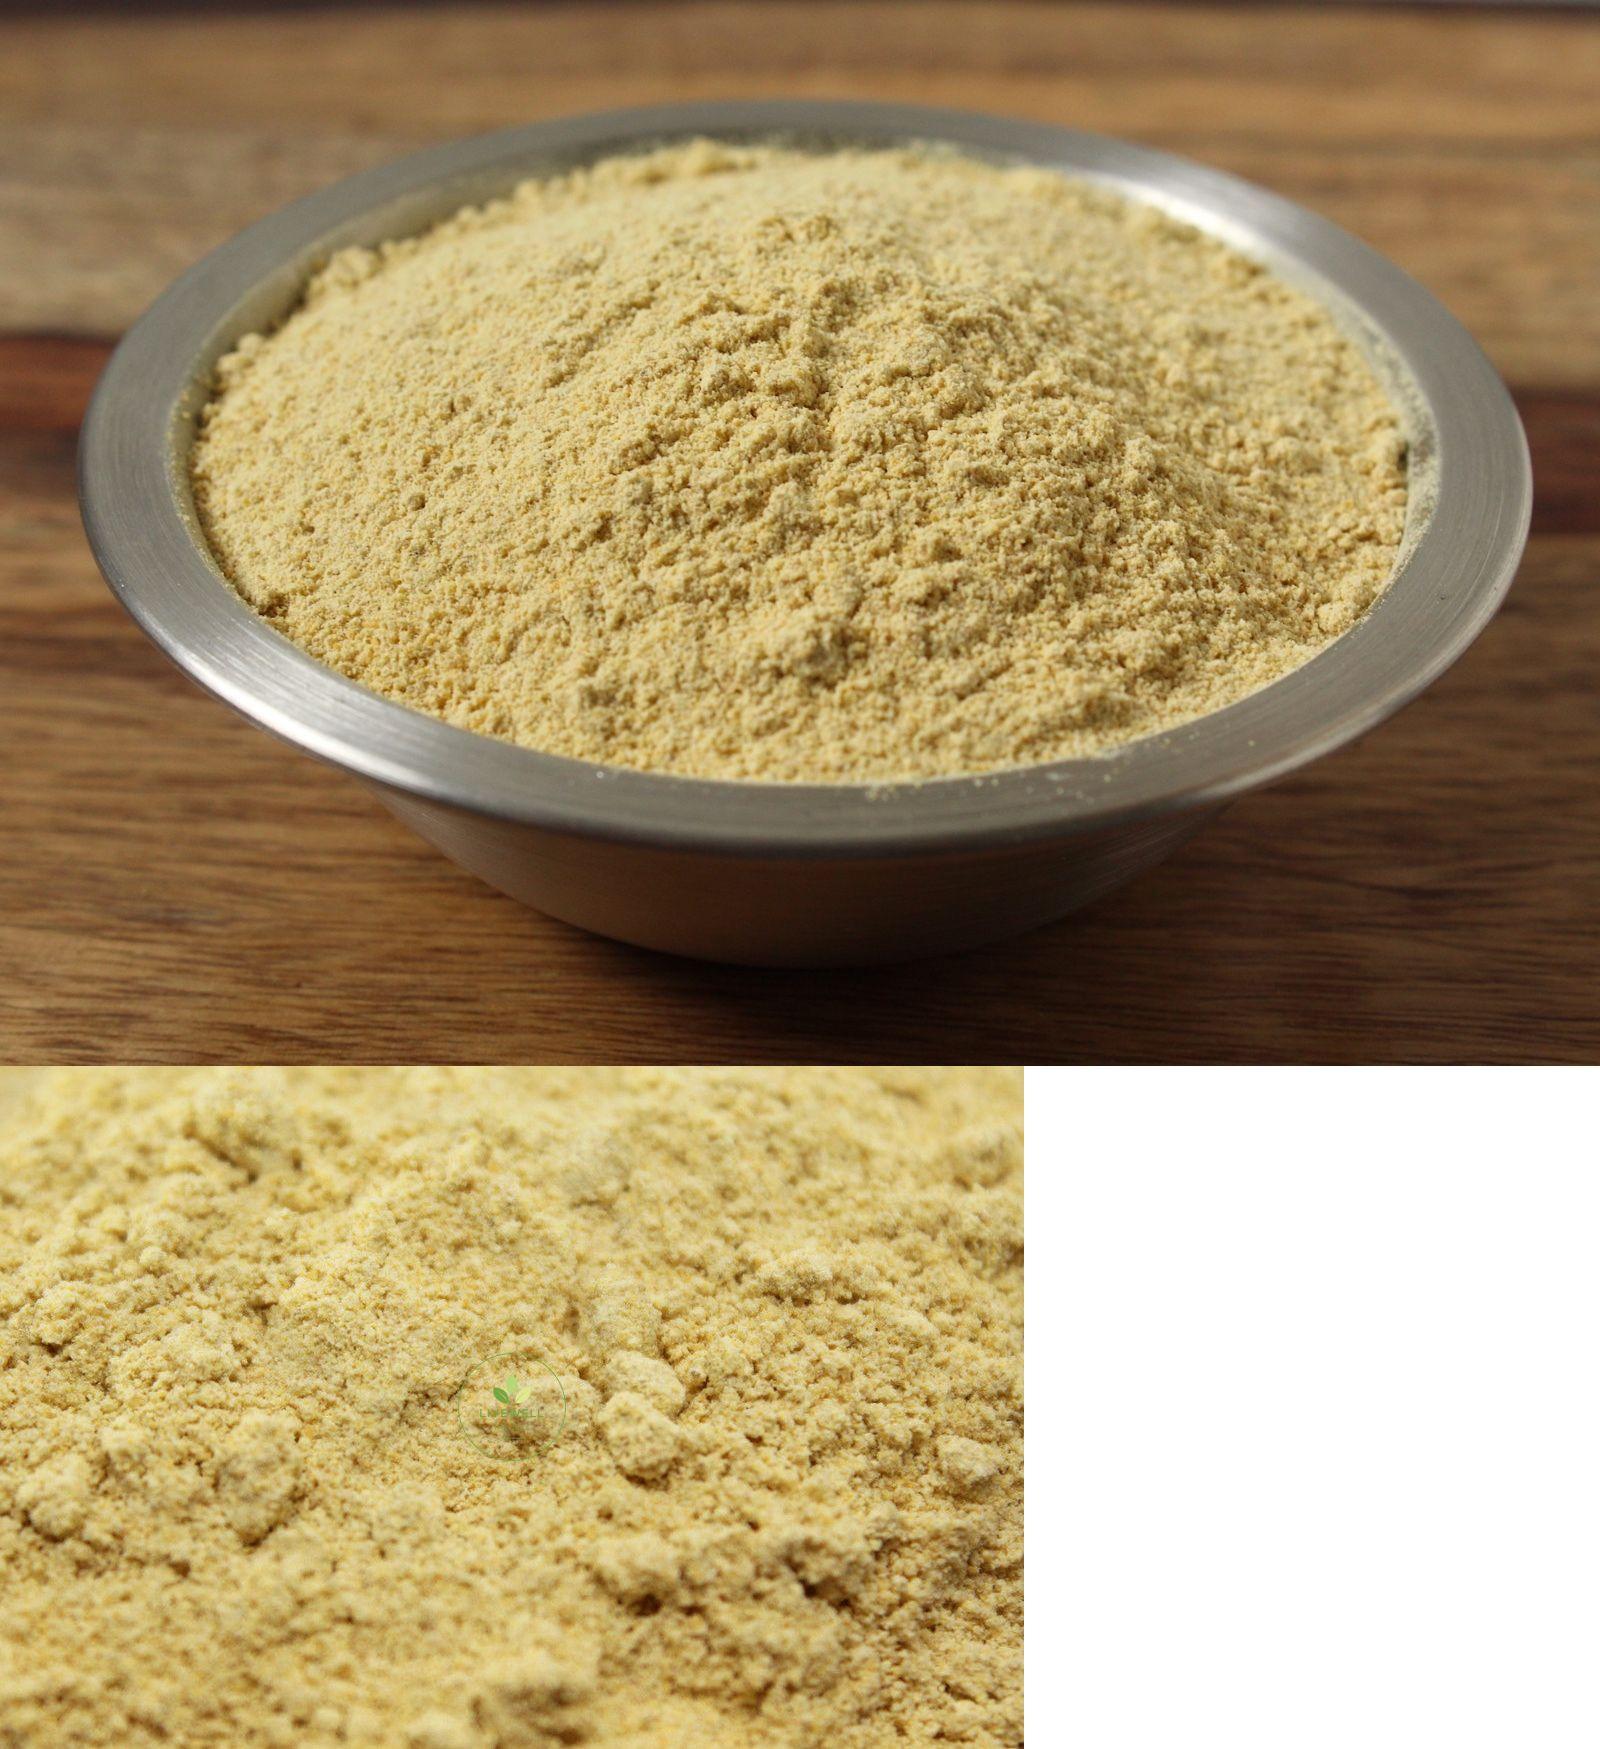 Bulk herbs wholesale - Herbs And Botanicals Organic Fenugreek Seed Powder Usda Certified Kosher 1lb 20lb Bulk Wholesale